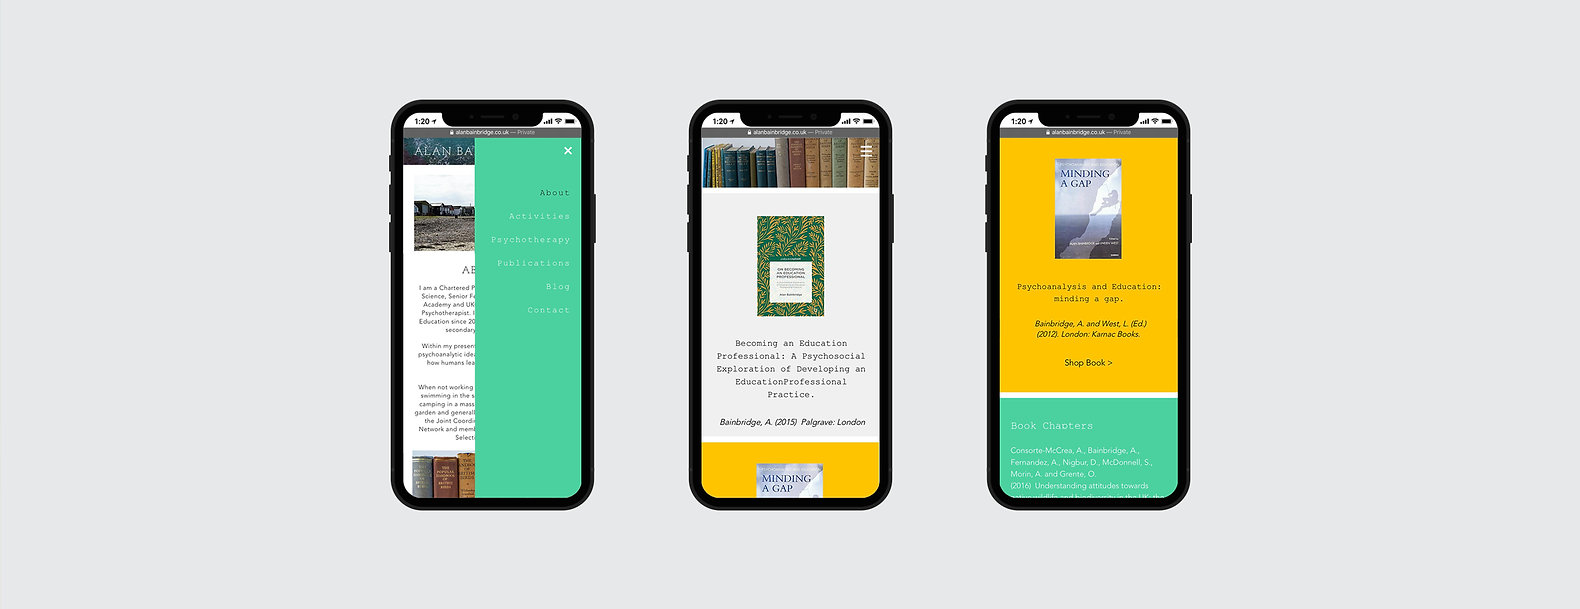 website-phones-alan.jpg